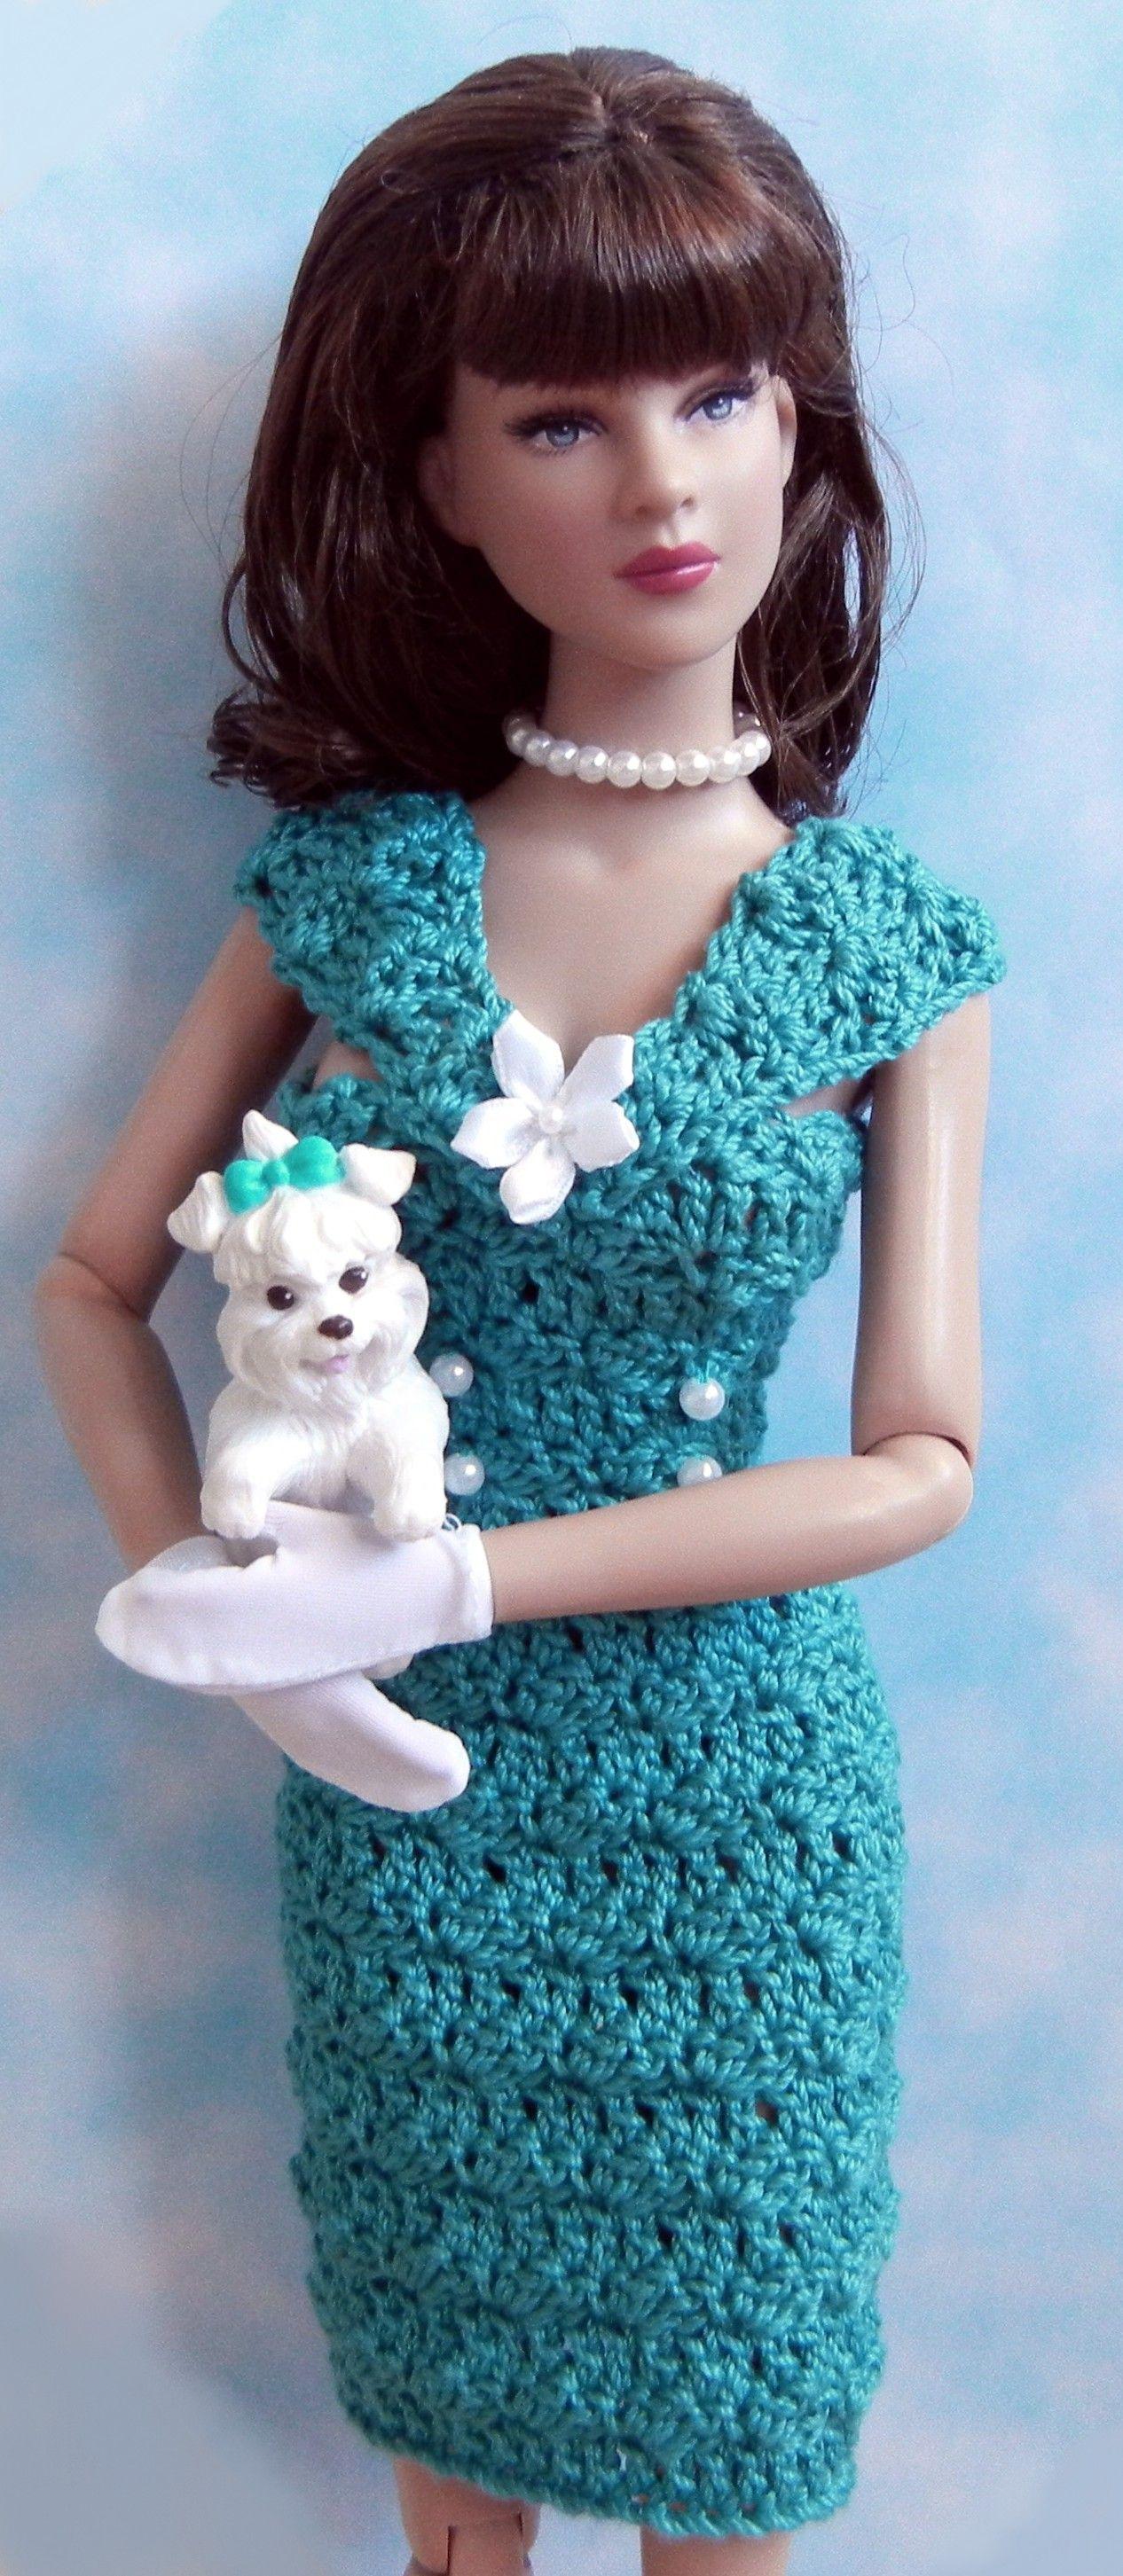 Crochet pattern (PDF) for 16-inch fashion doll - 1950s ...